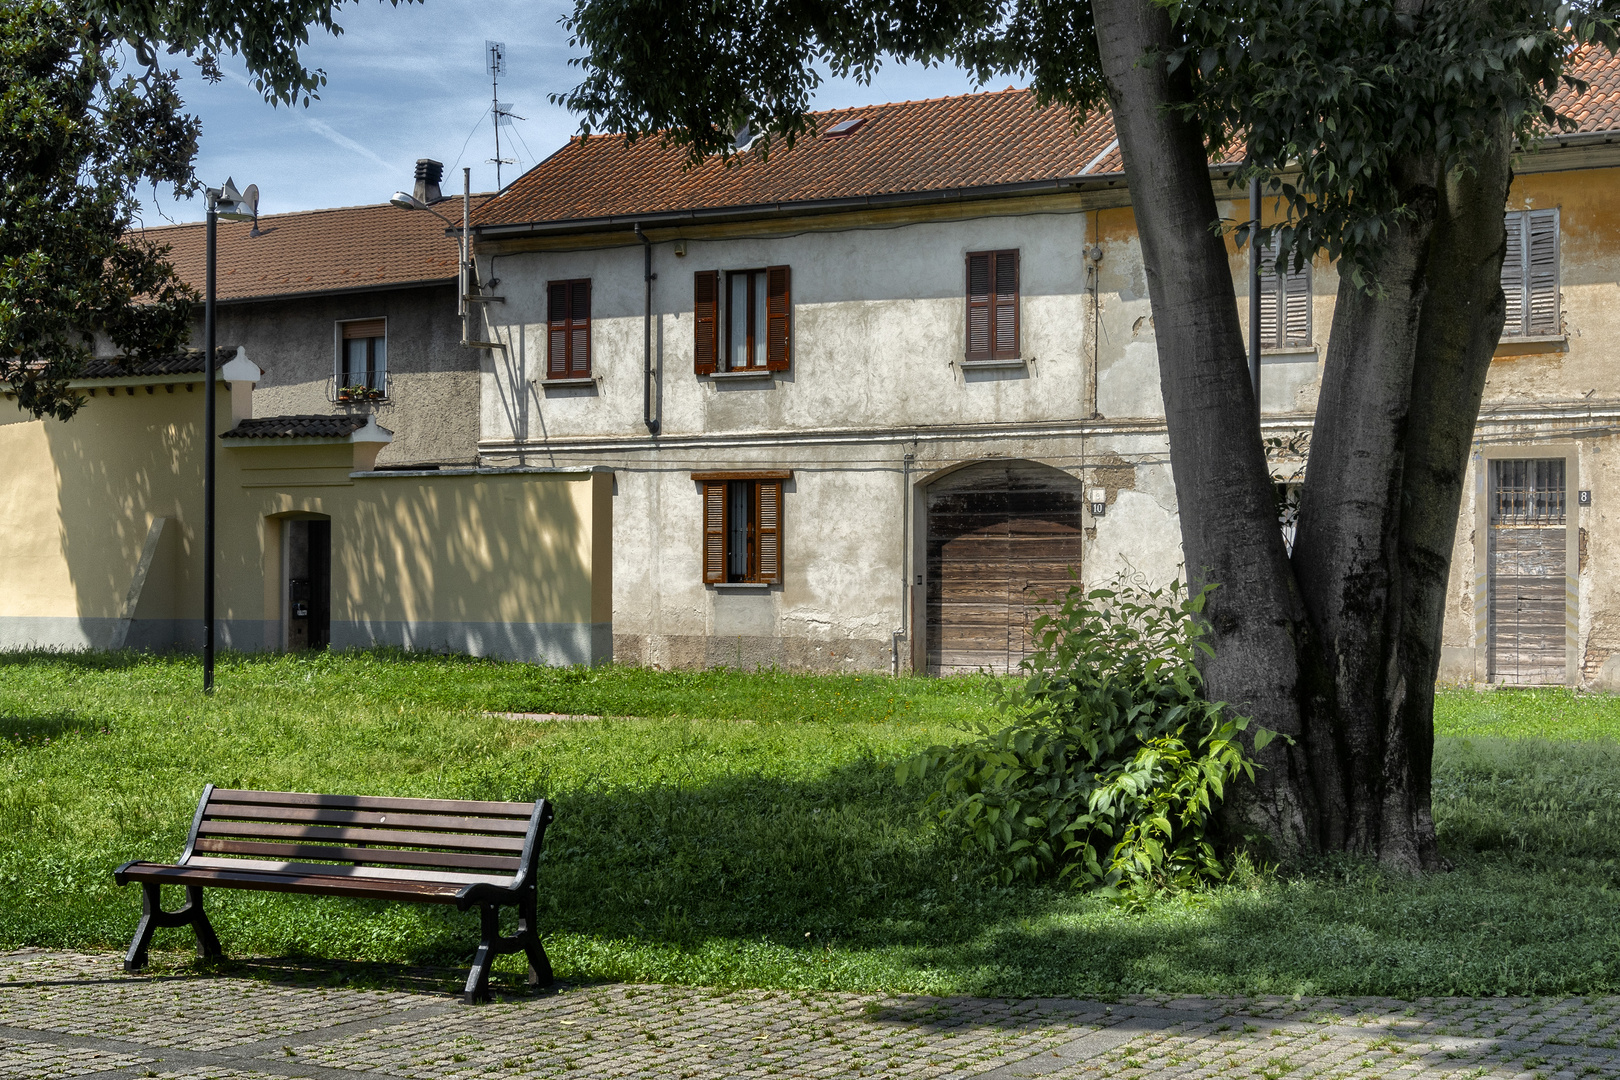 Parco Don Enrico Civillini, Pioltello